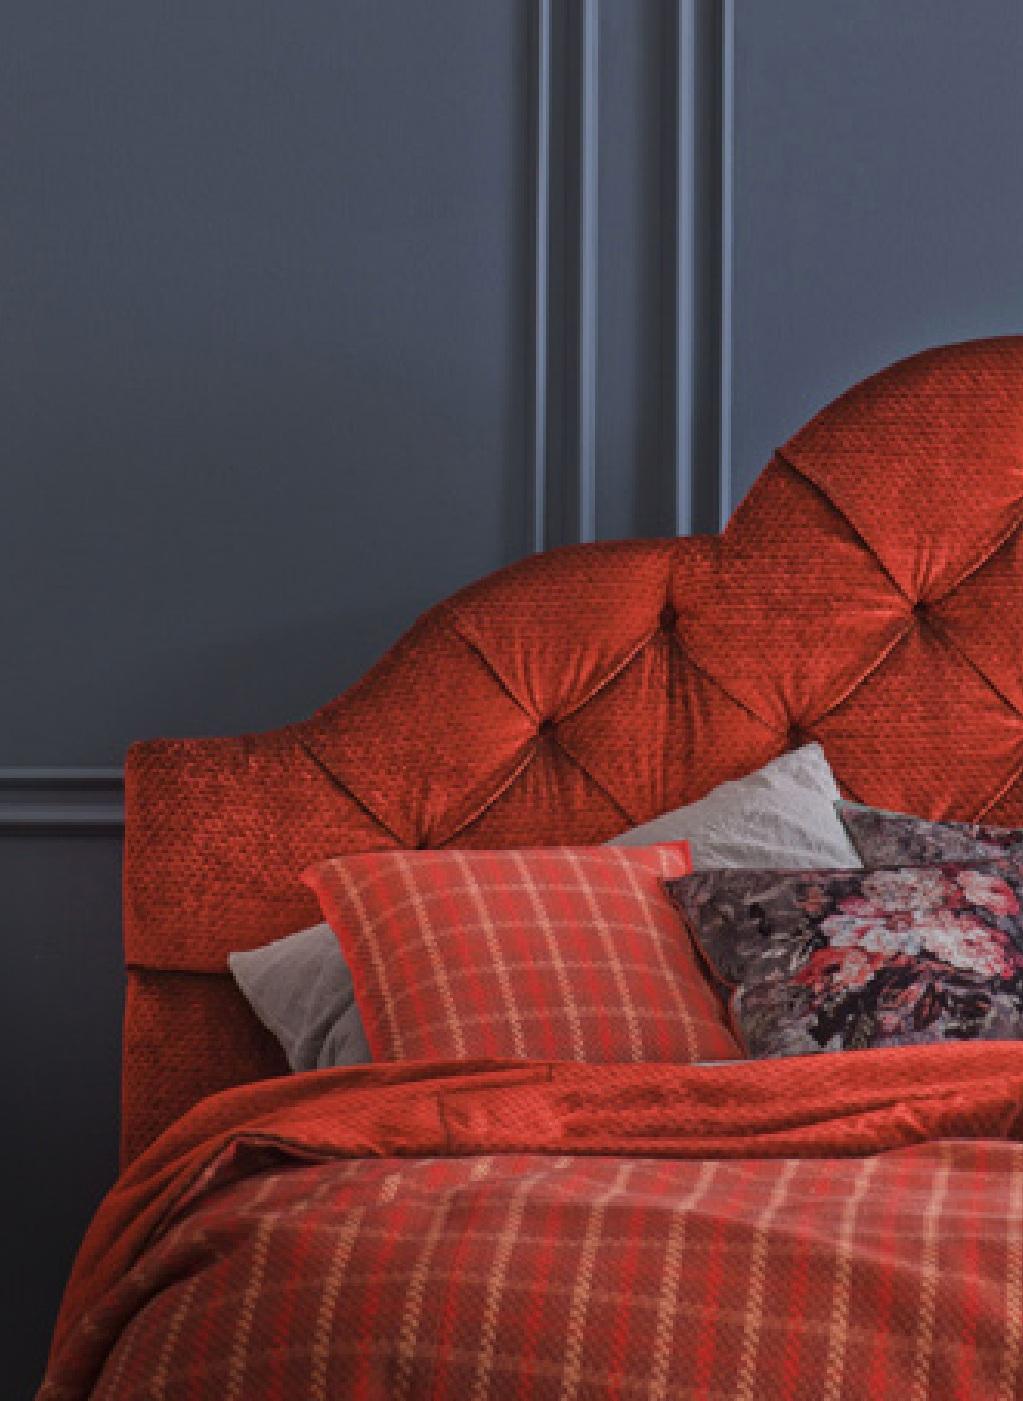 01. JOLIE, Fine, a collection of velvet fabrics for upholstered furniture